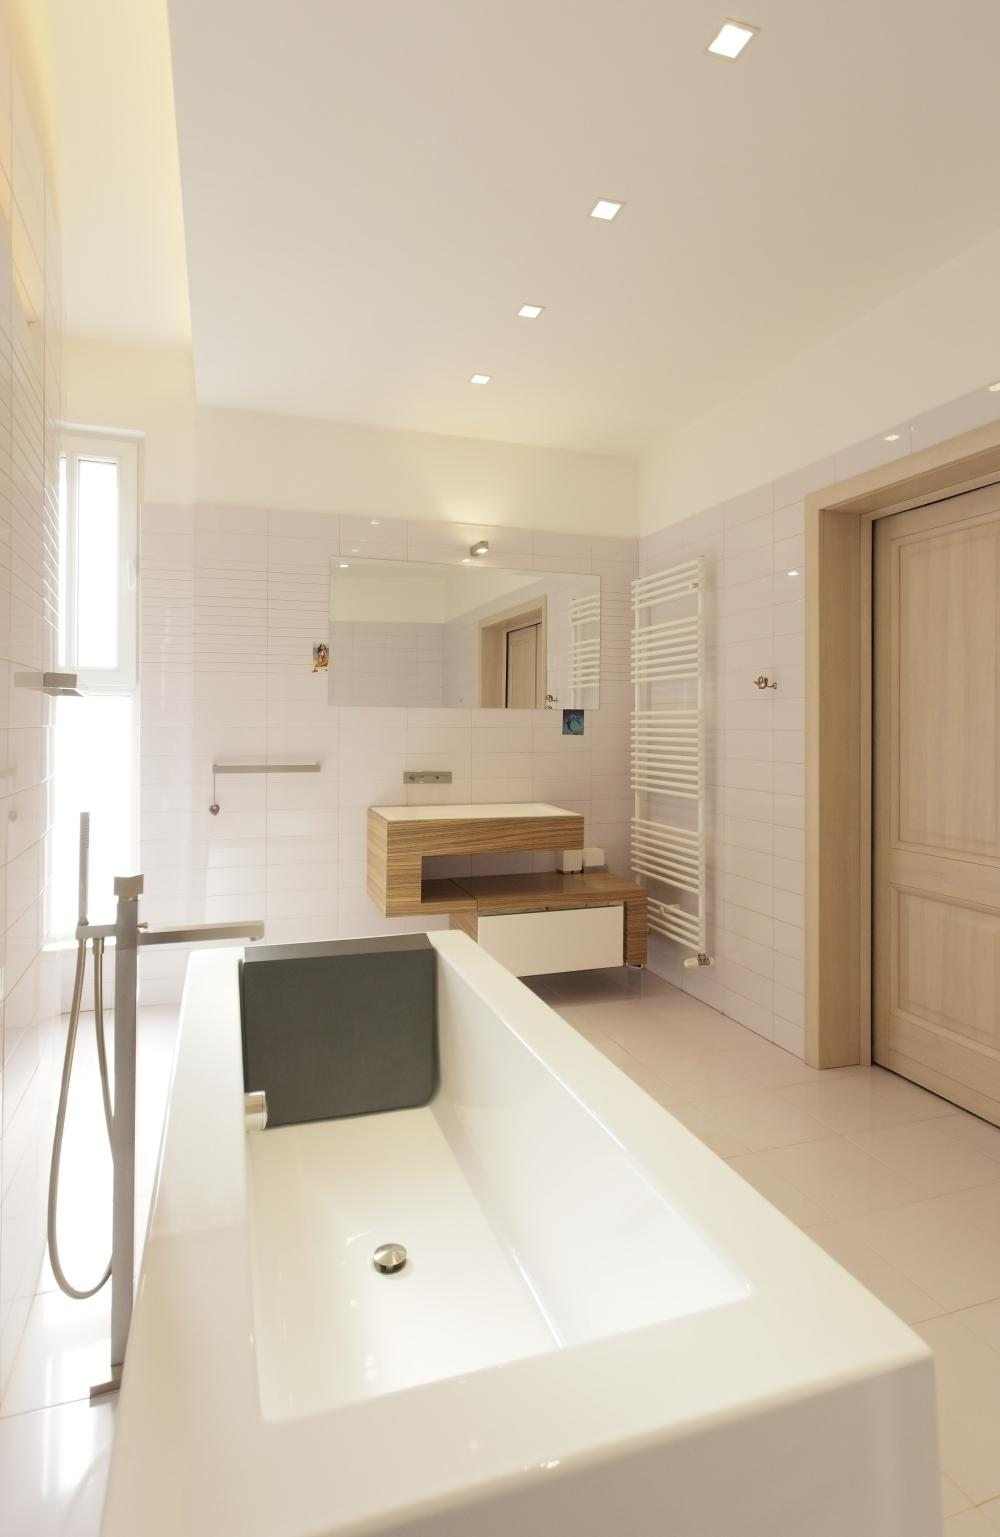 https://nbc-arhitect.ro/wp-content/uploads/2020/10/NBC-Arhitect-_-Cube-House-_-Bucharest-Romania-_-interior-view-bathroom_3.jpg